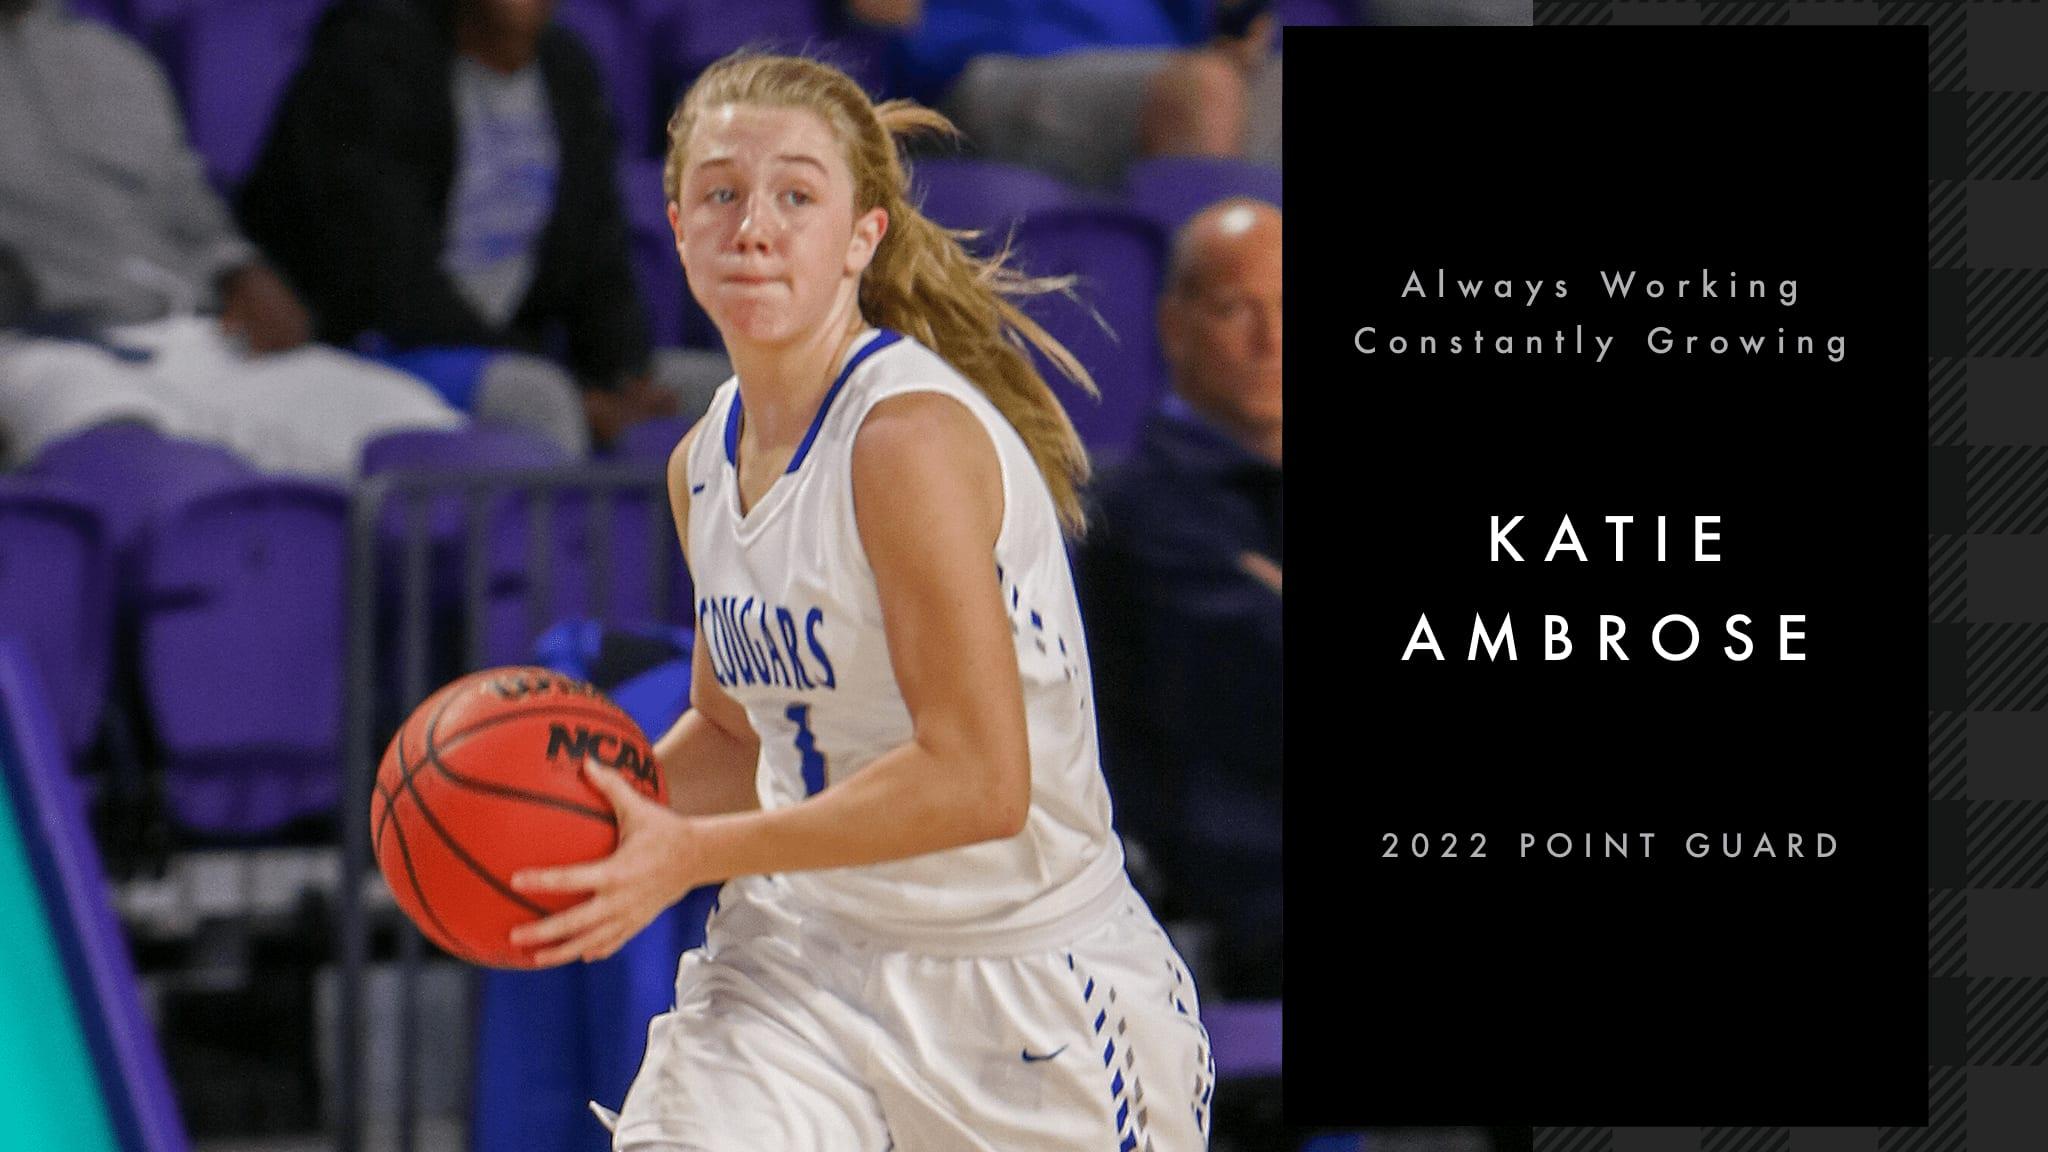 Katie Ambrose: Always Working, Constantly Growing